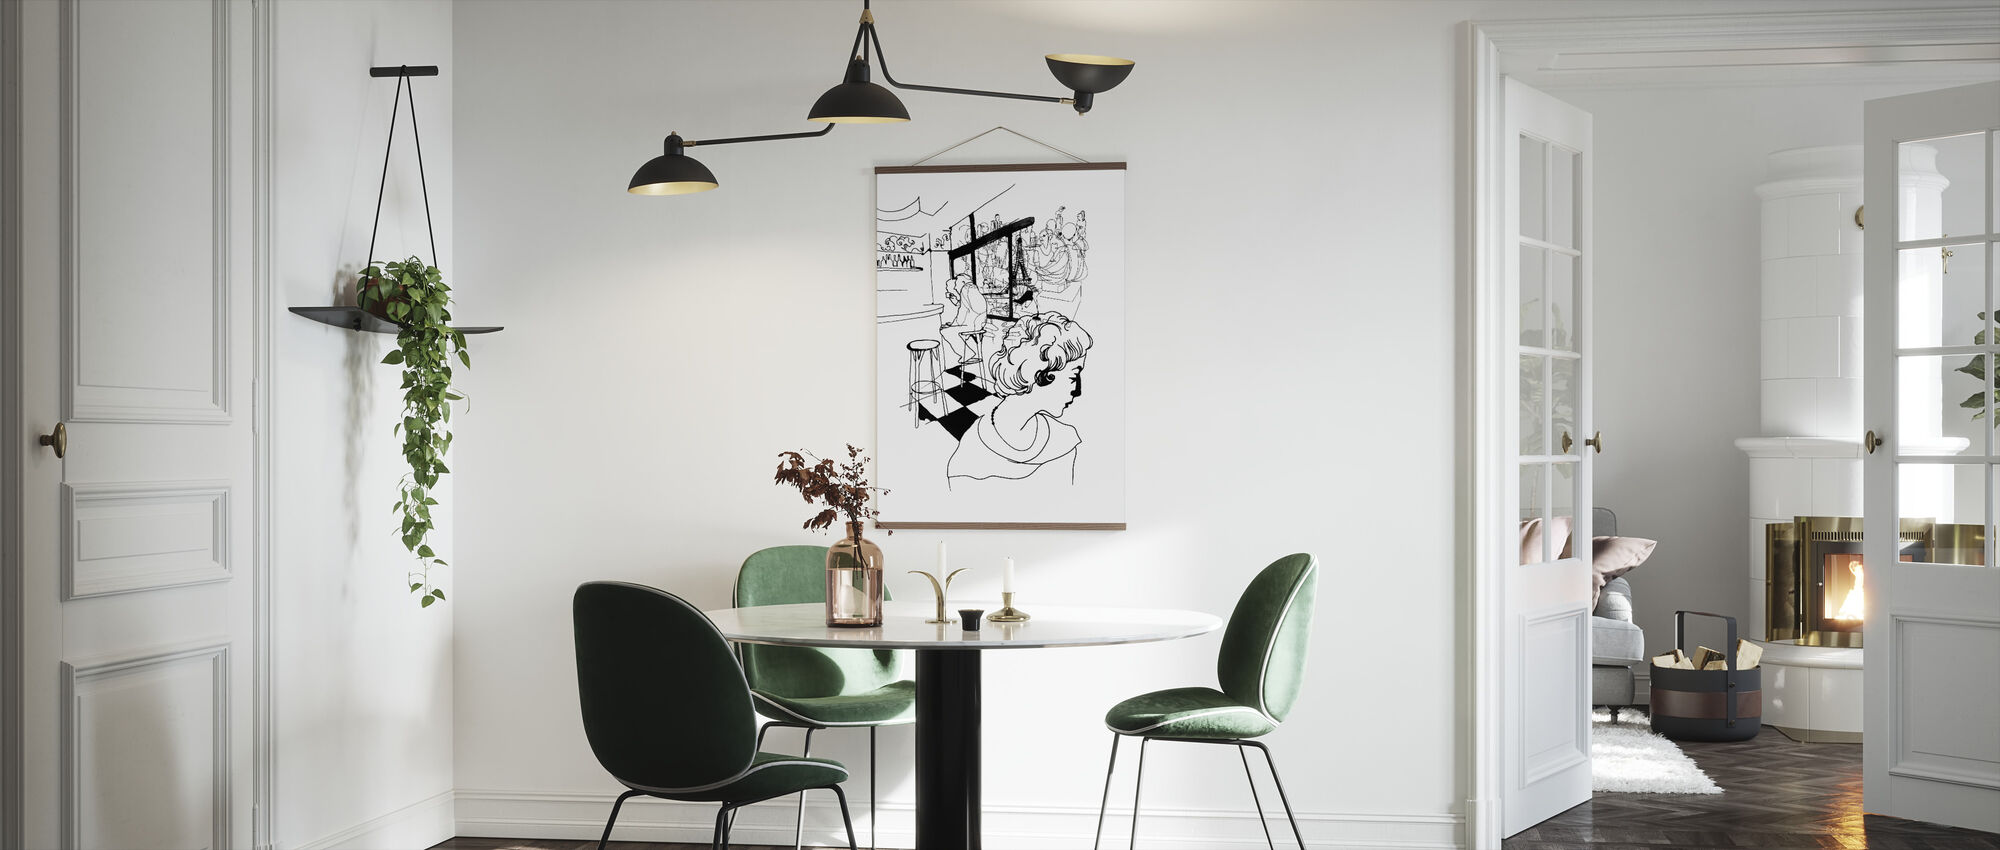 Kaffe i Paris - Poster - Kök